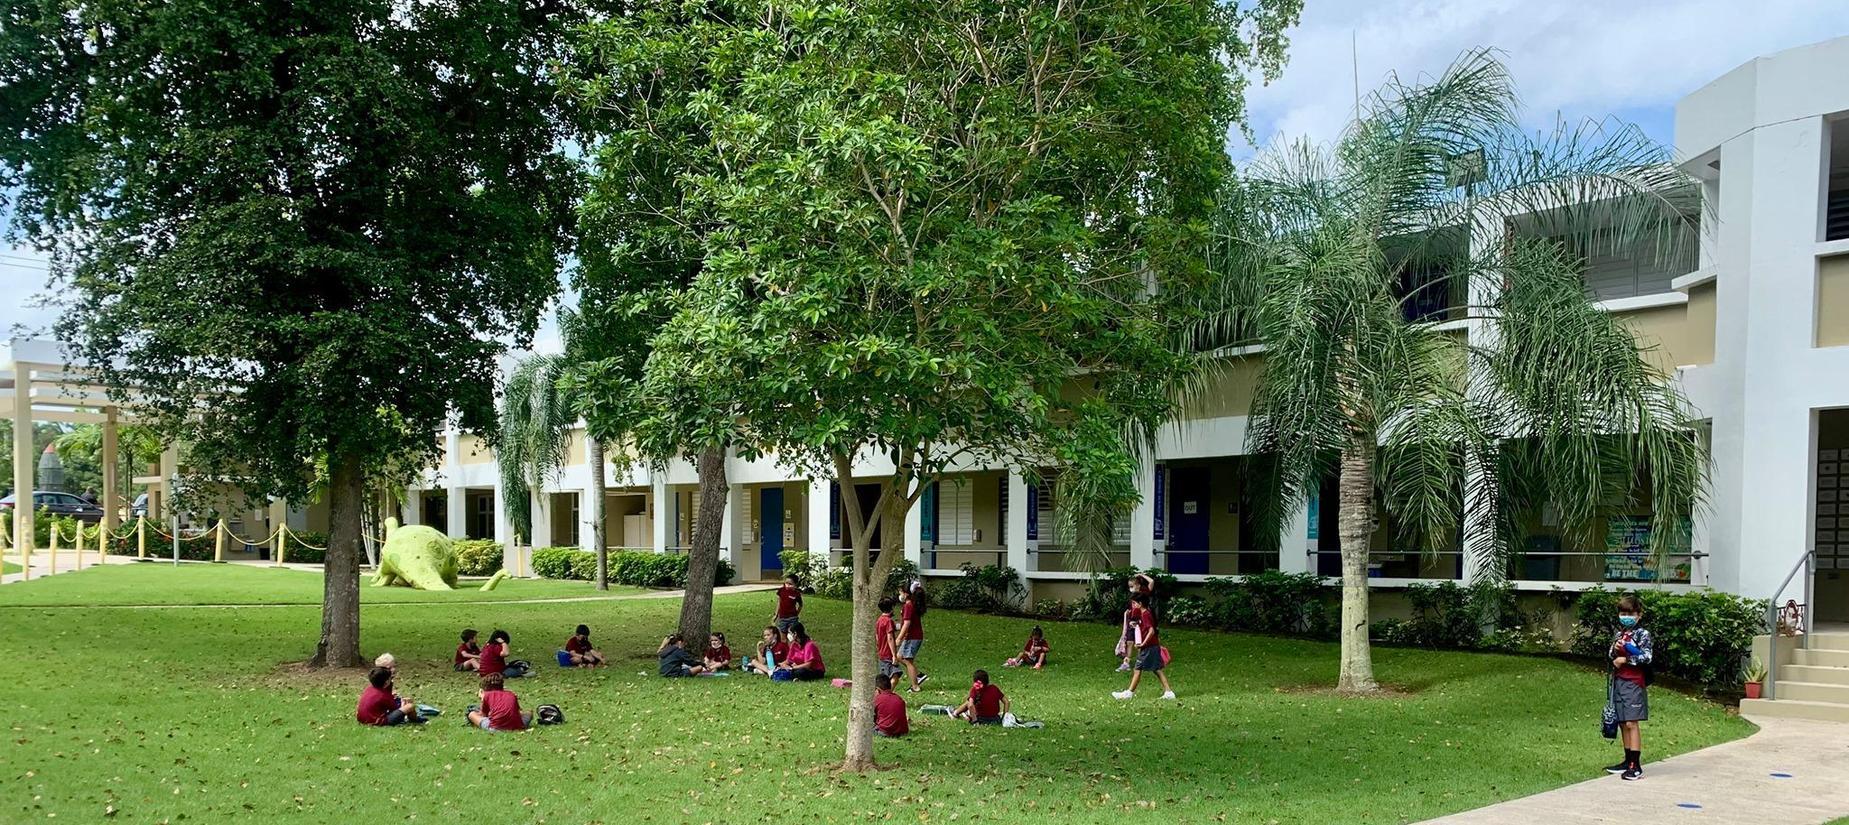 Elementary class outside